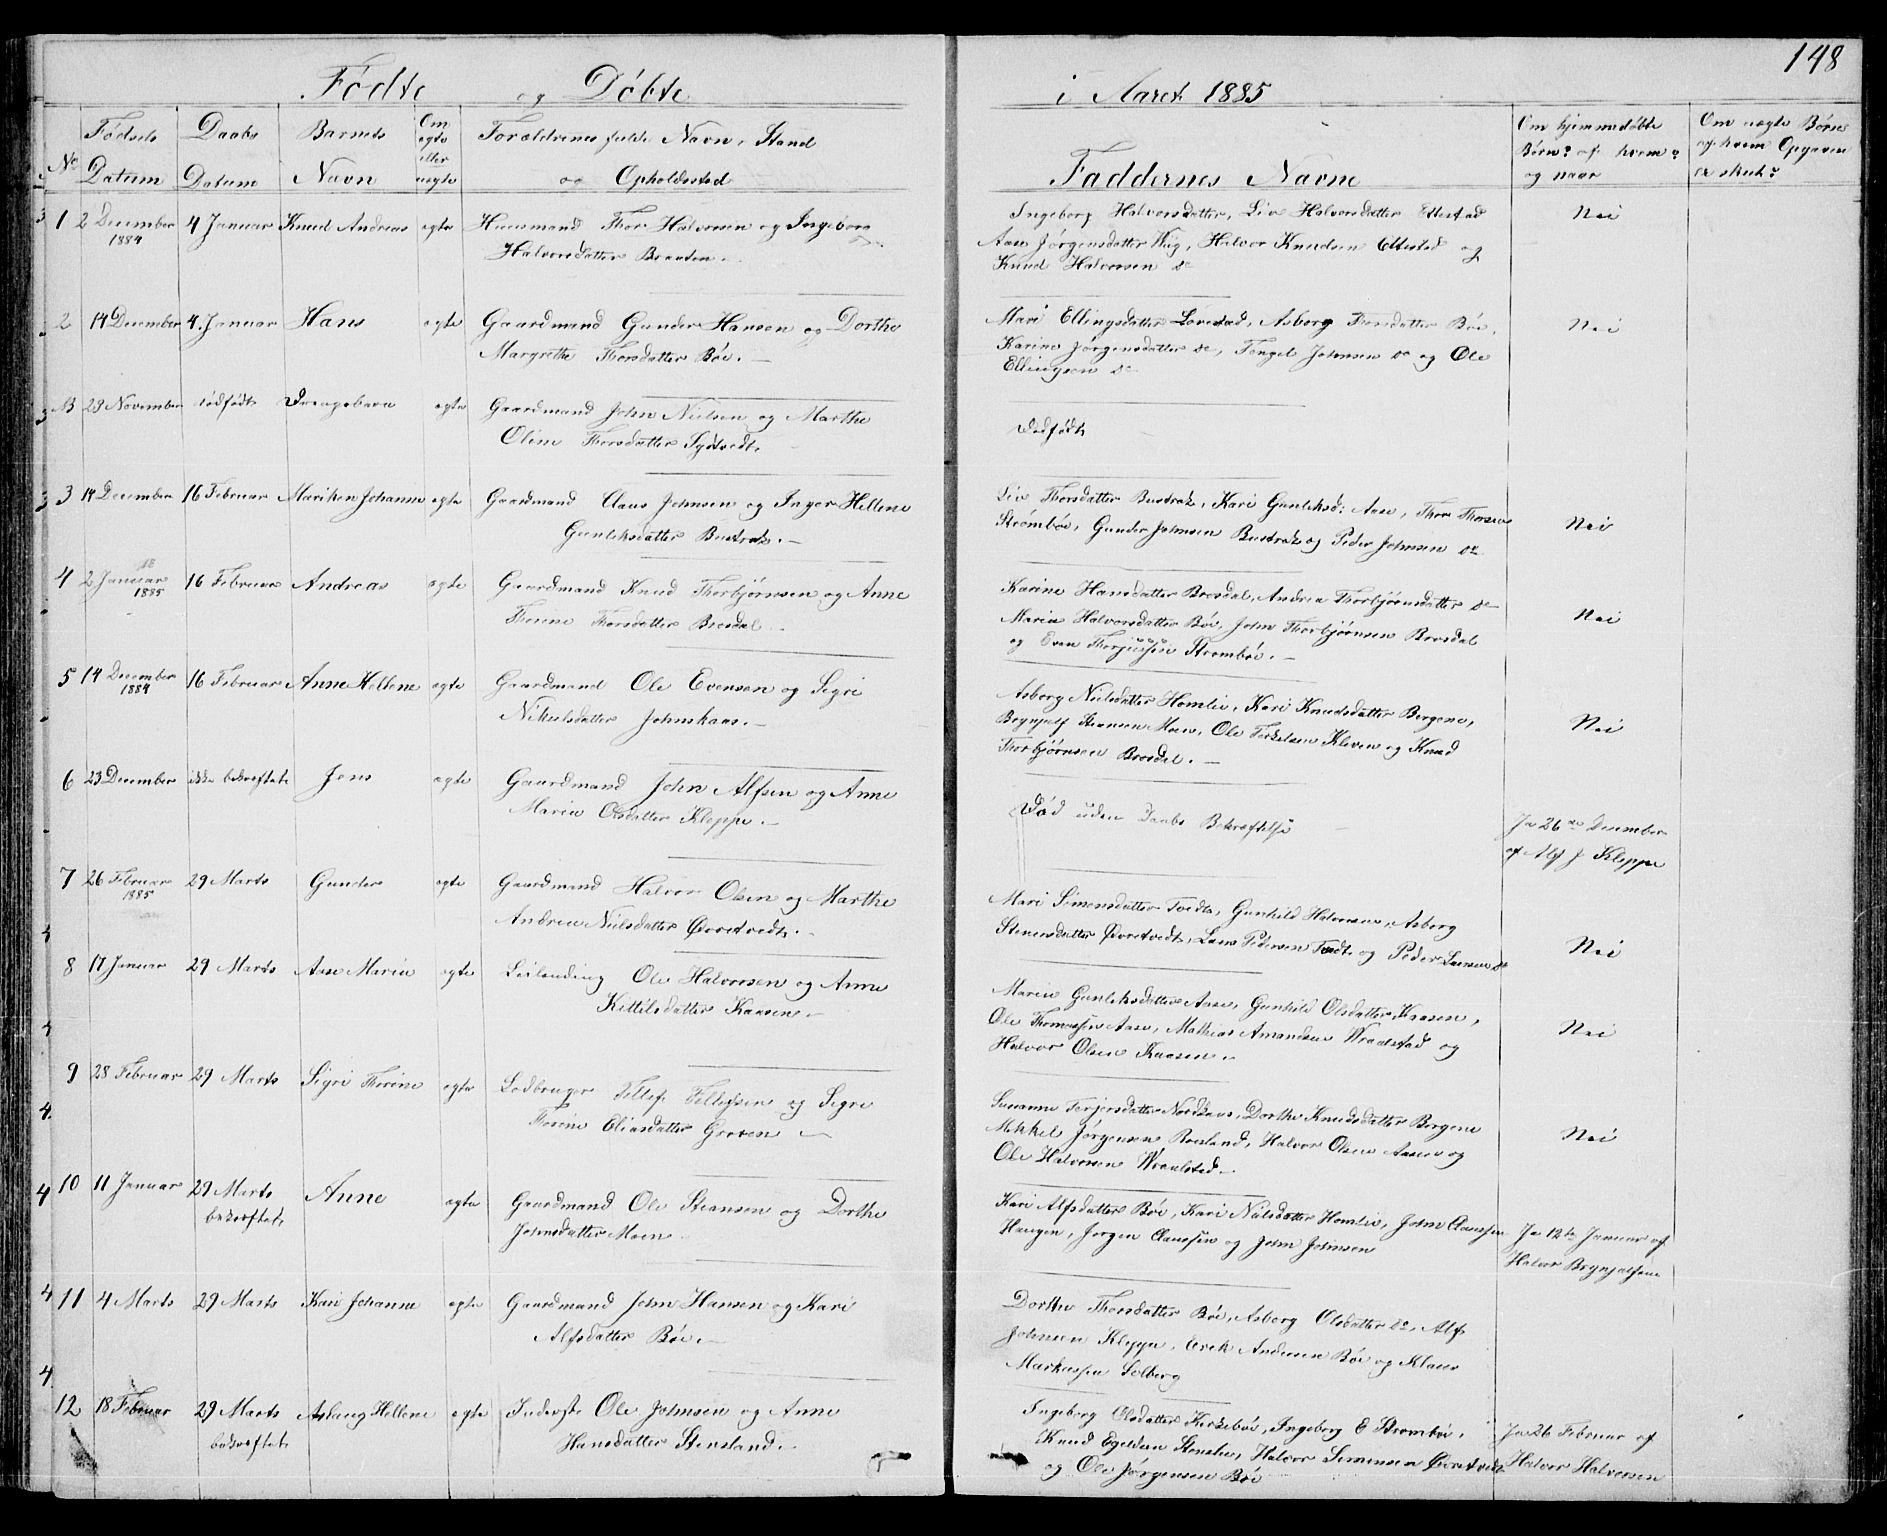 SAKO, Drangedal kirkebøker, G/Gb/L0001: Klokkerbok nr. II 1, 1856-1894, s. 148